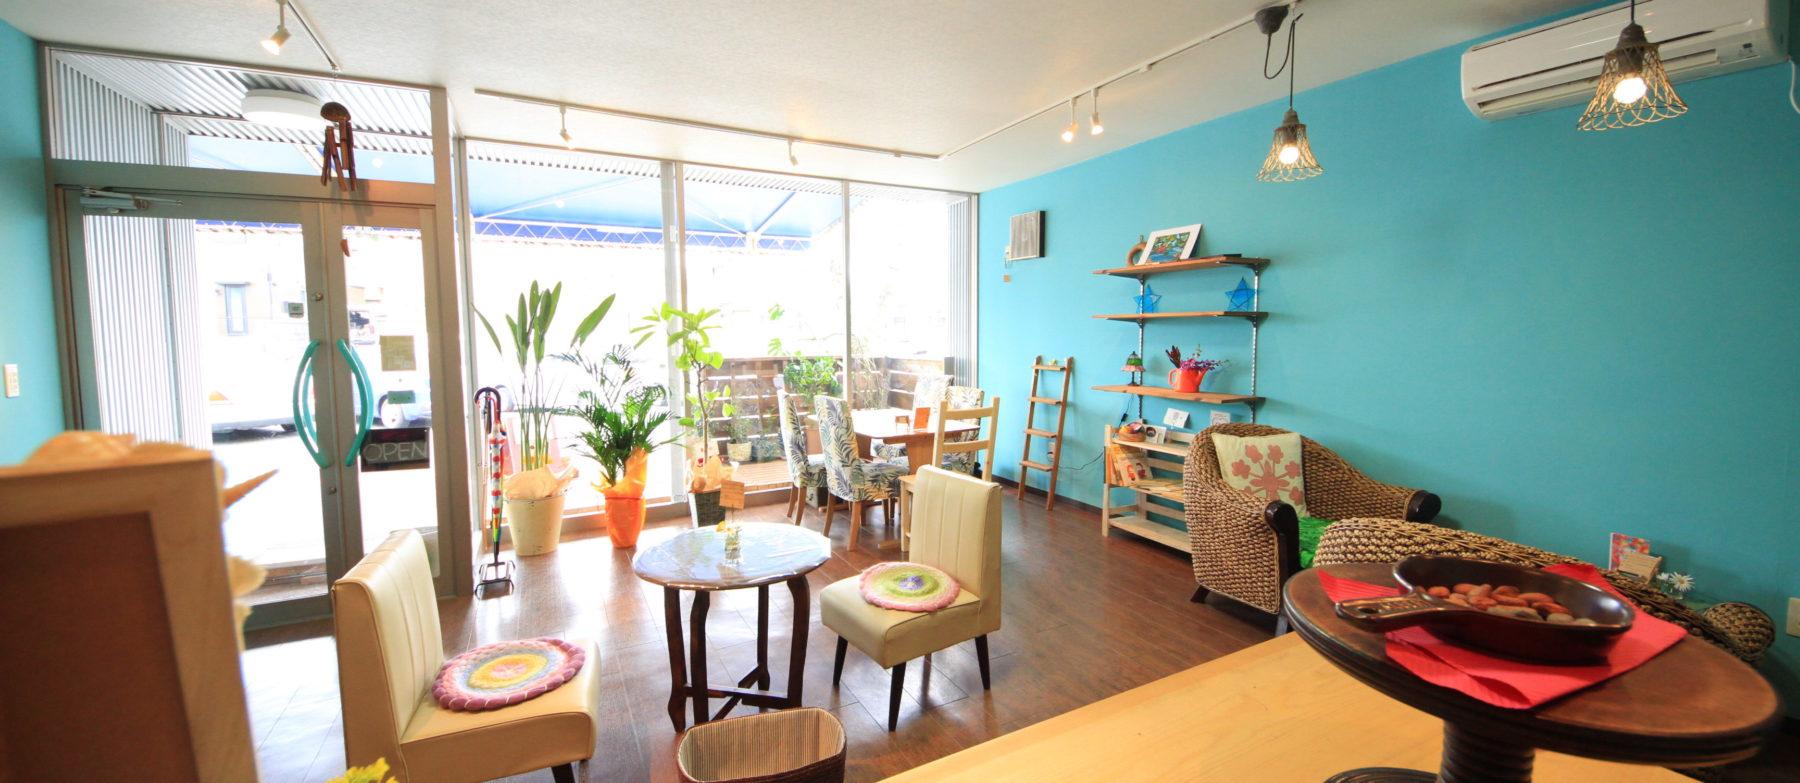 image-瀬戸のカフェとサロン ラアマオマオ